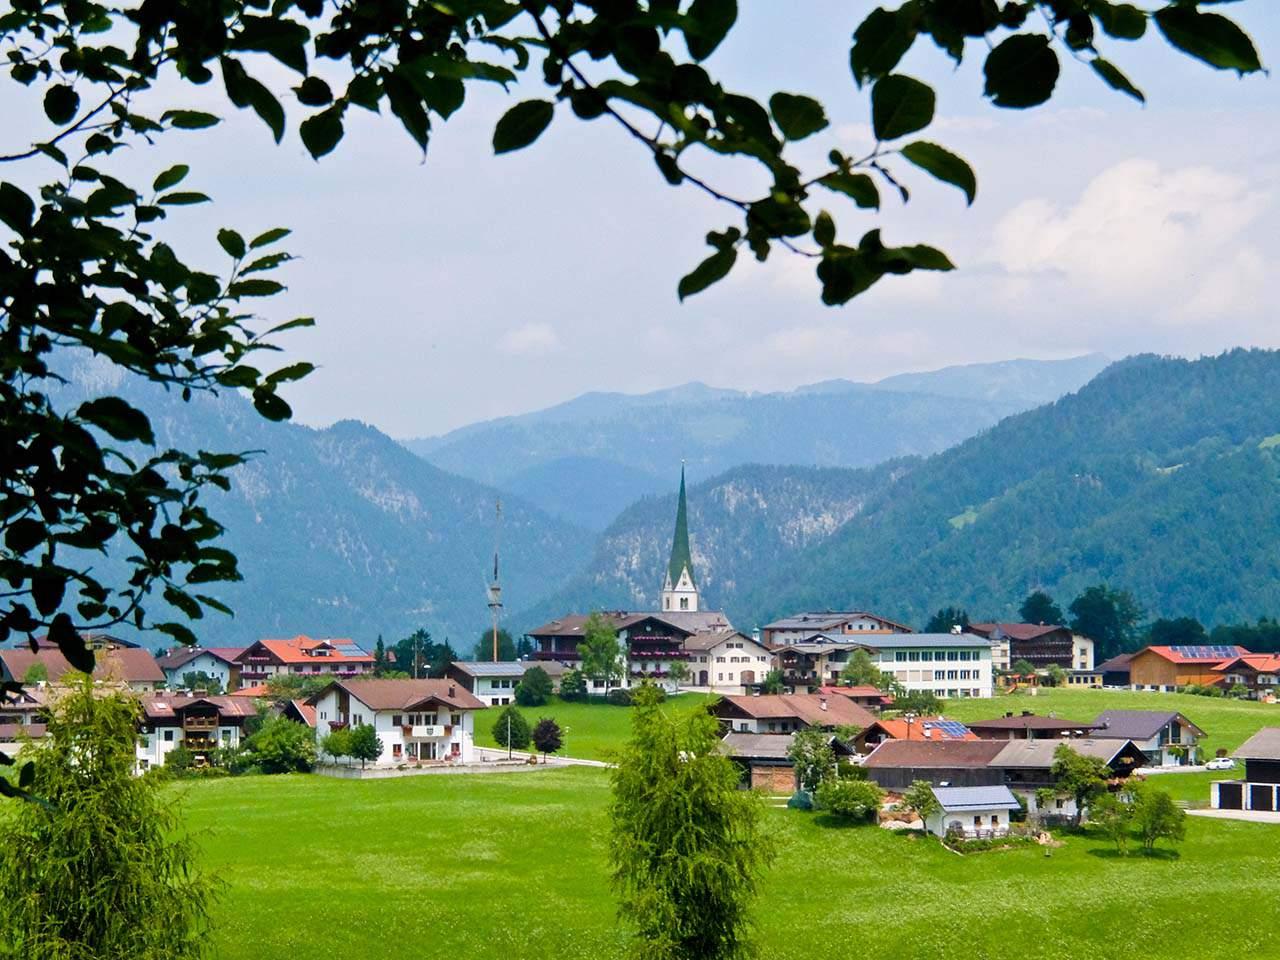 Brandenberg Alps, Tyrol - Brandenberg